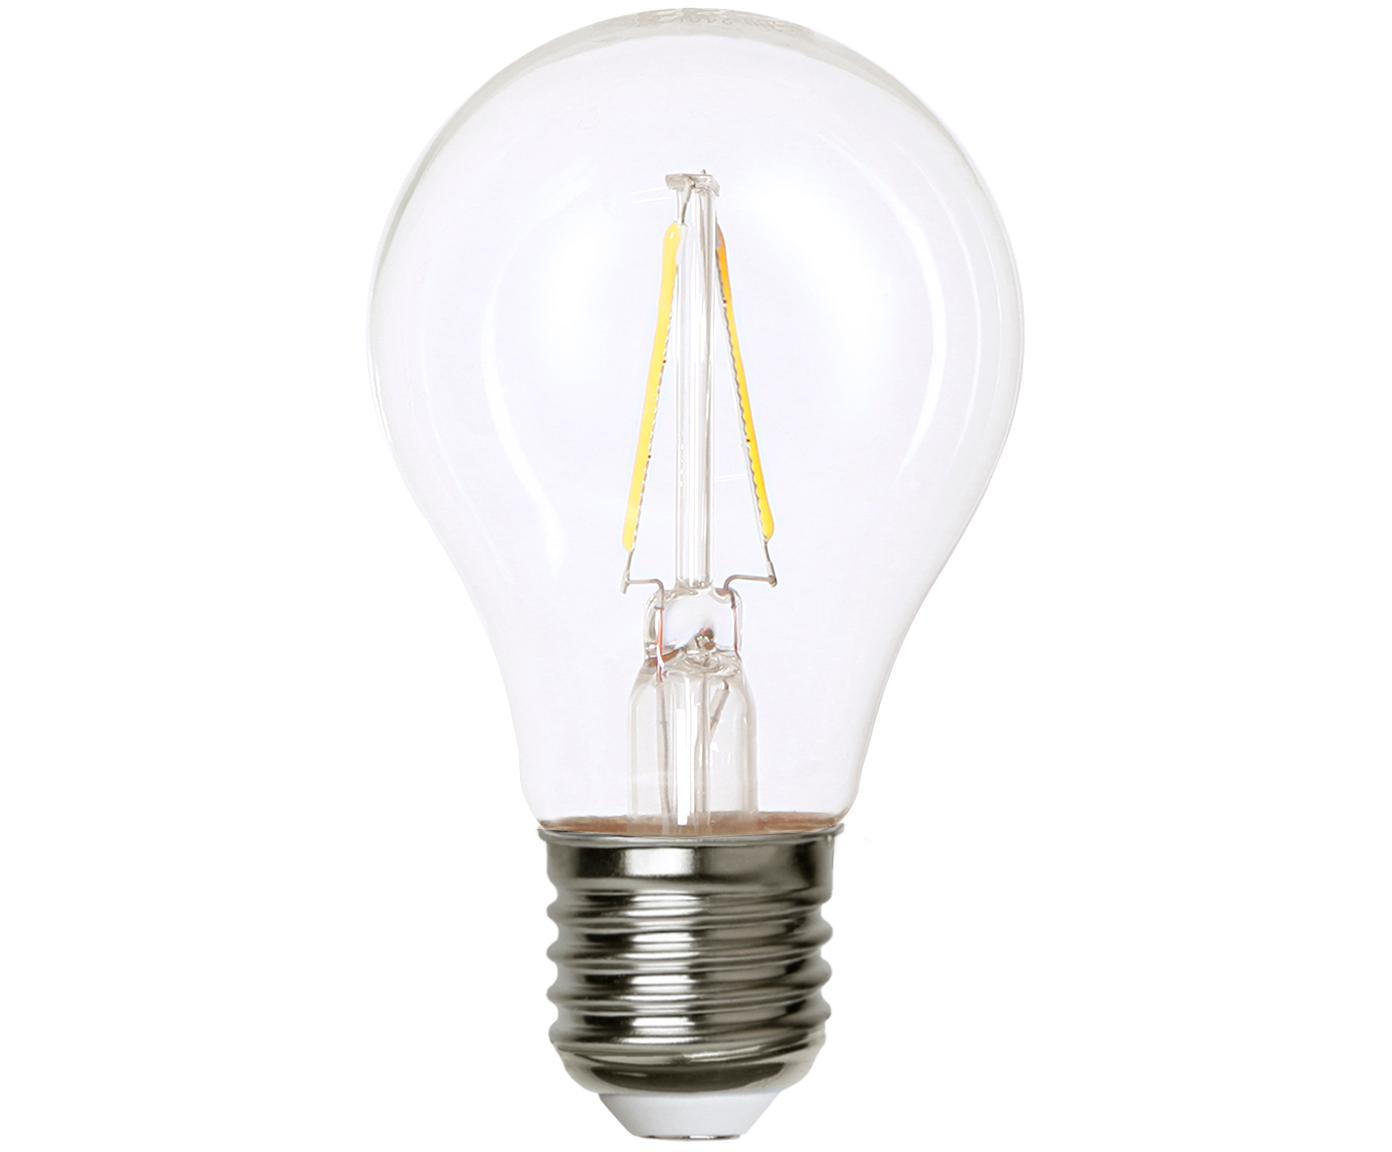 Bombilla LED Airtight Two (E27/2W), Ampolla: vidrio, Casquillo: cobre niquelado, Transparente, níquel, Ø 6 x Al 11 cm